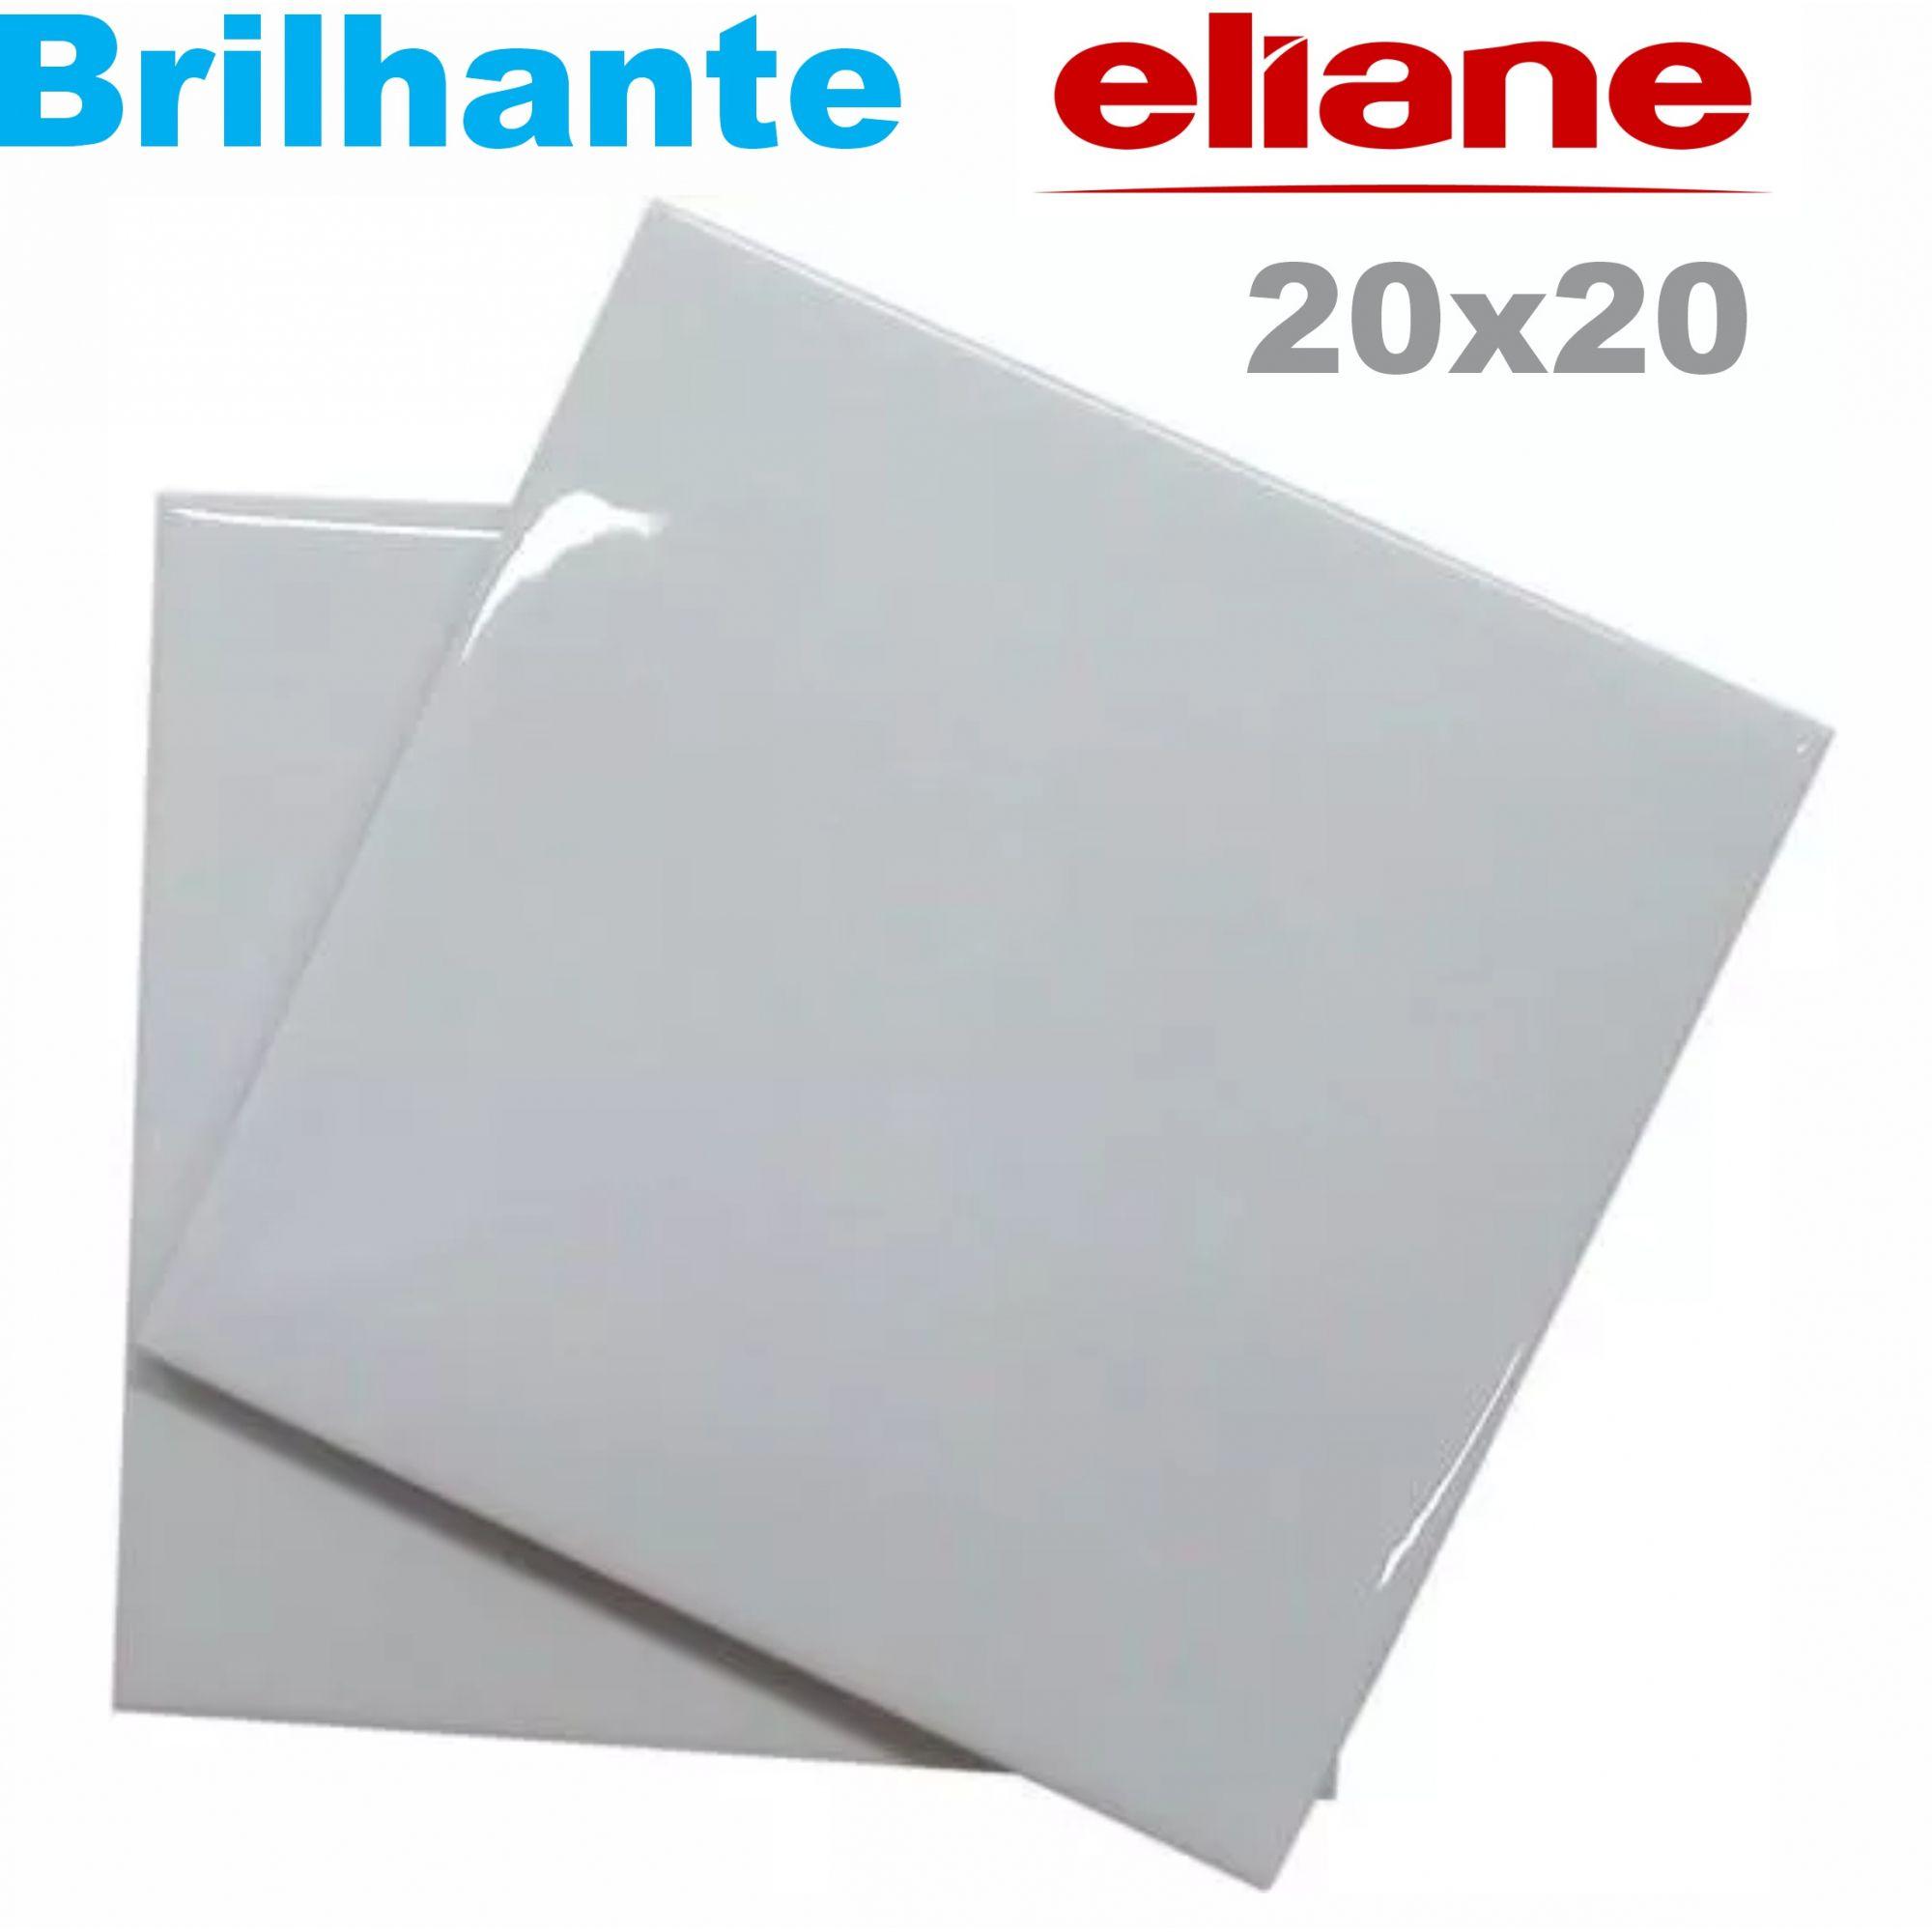 Azulejo Brilhante 20x20